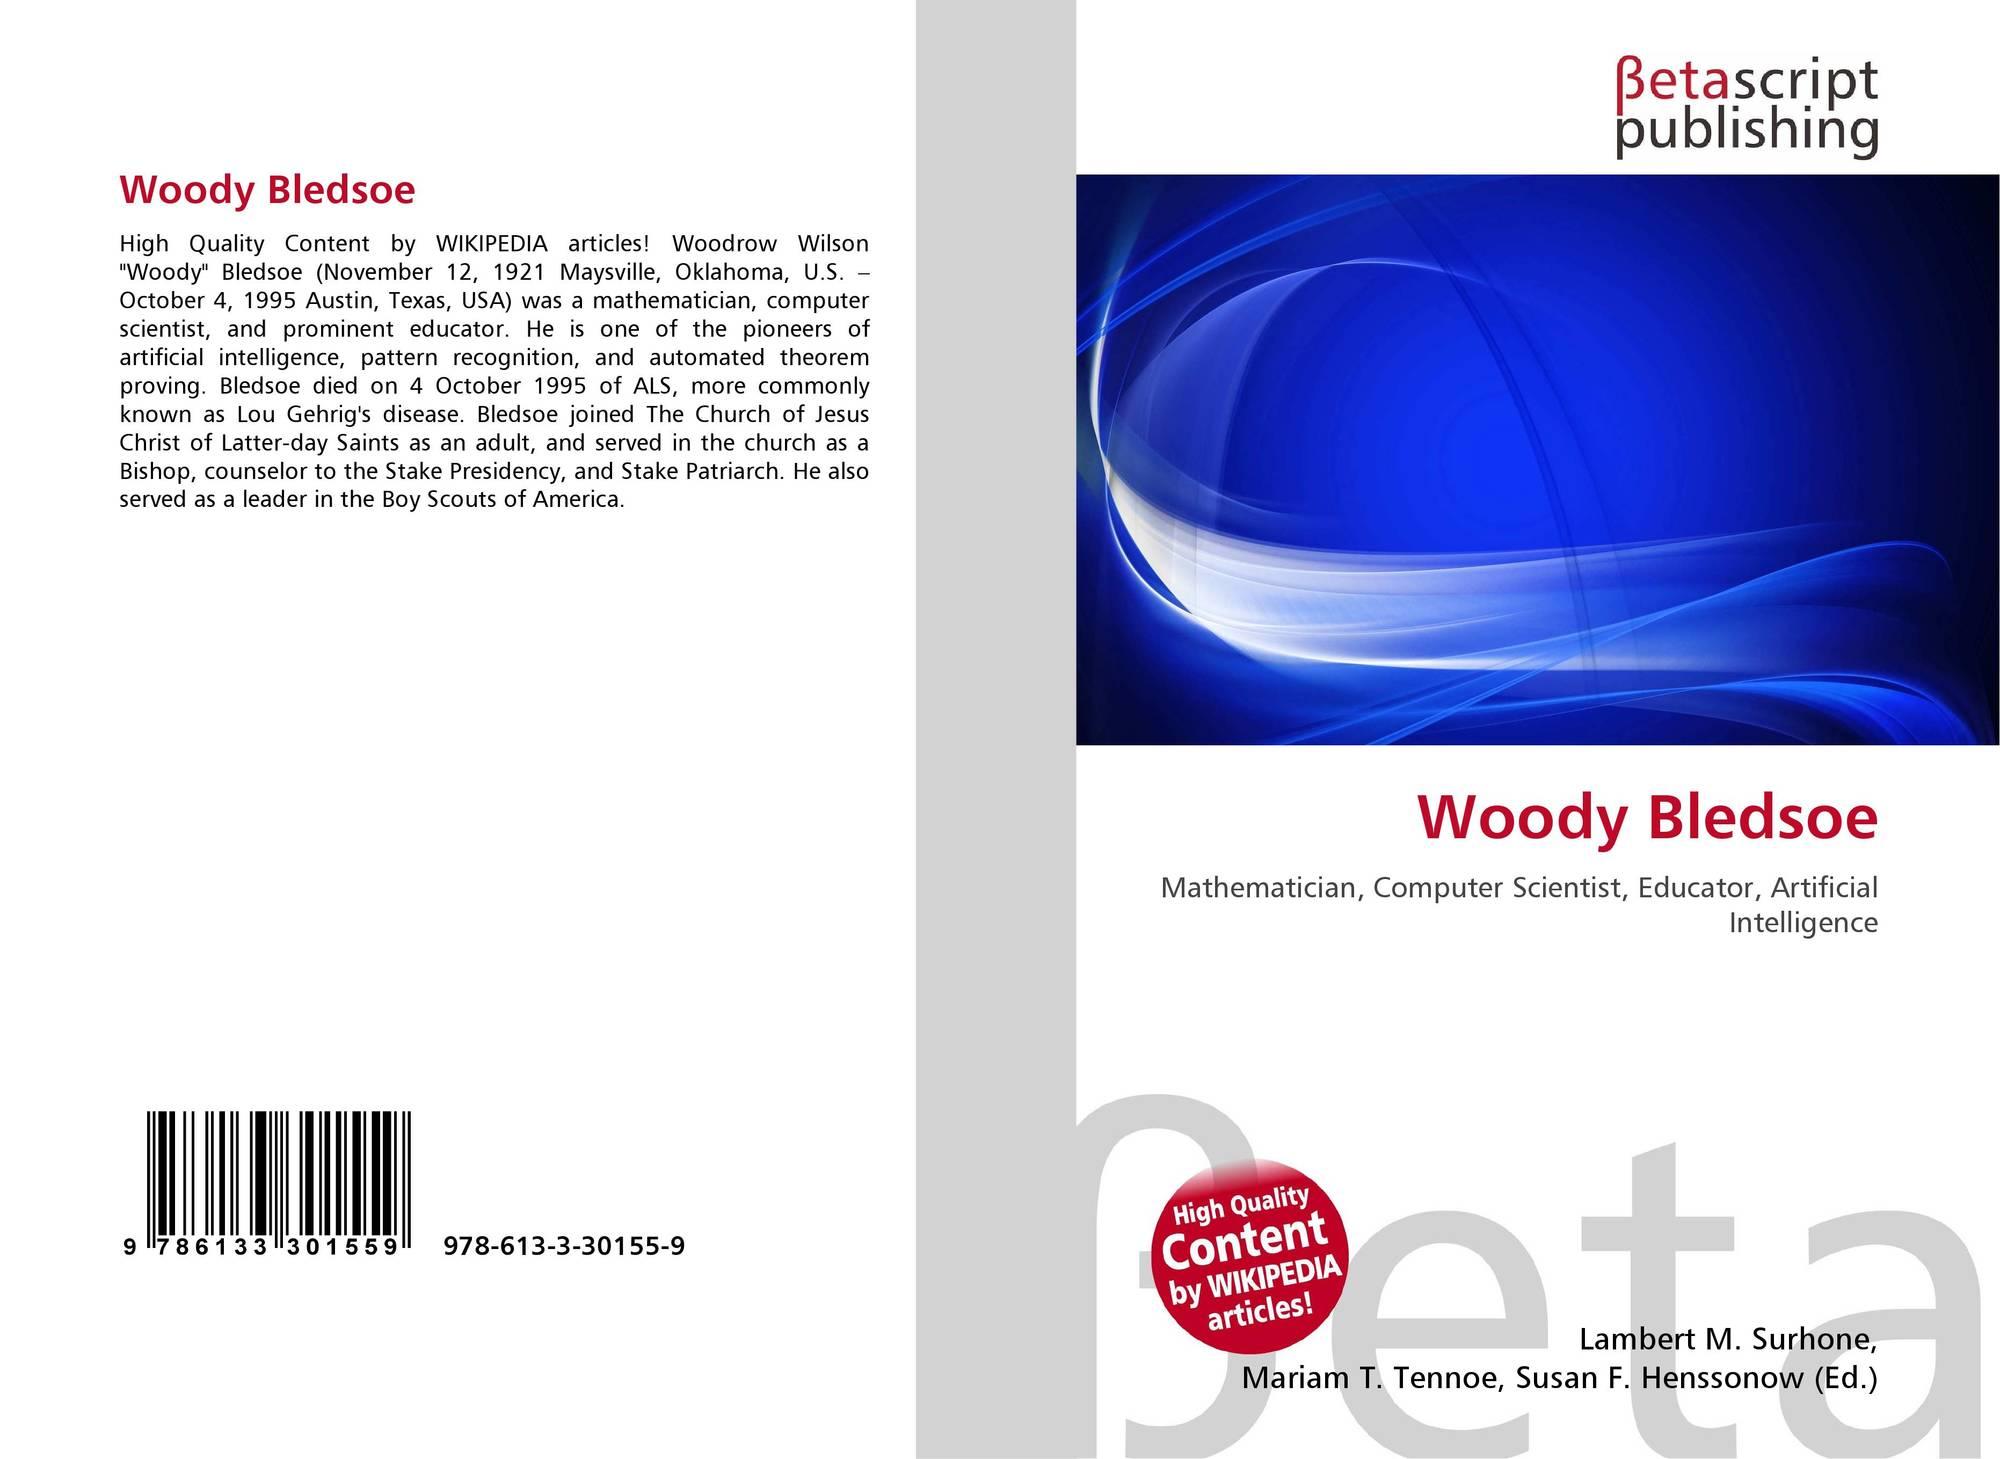 Woody Bledsoe